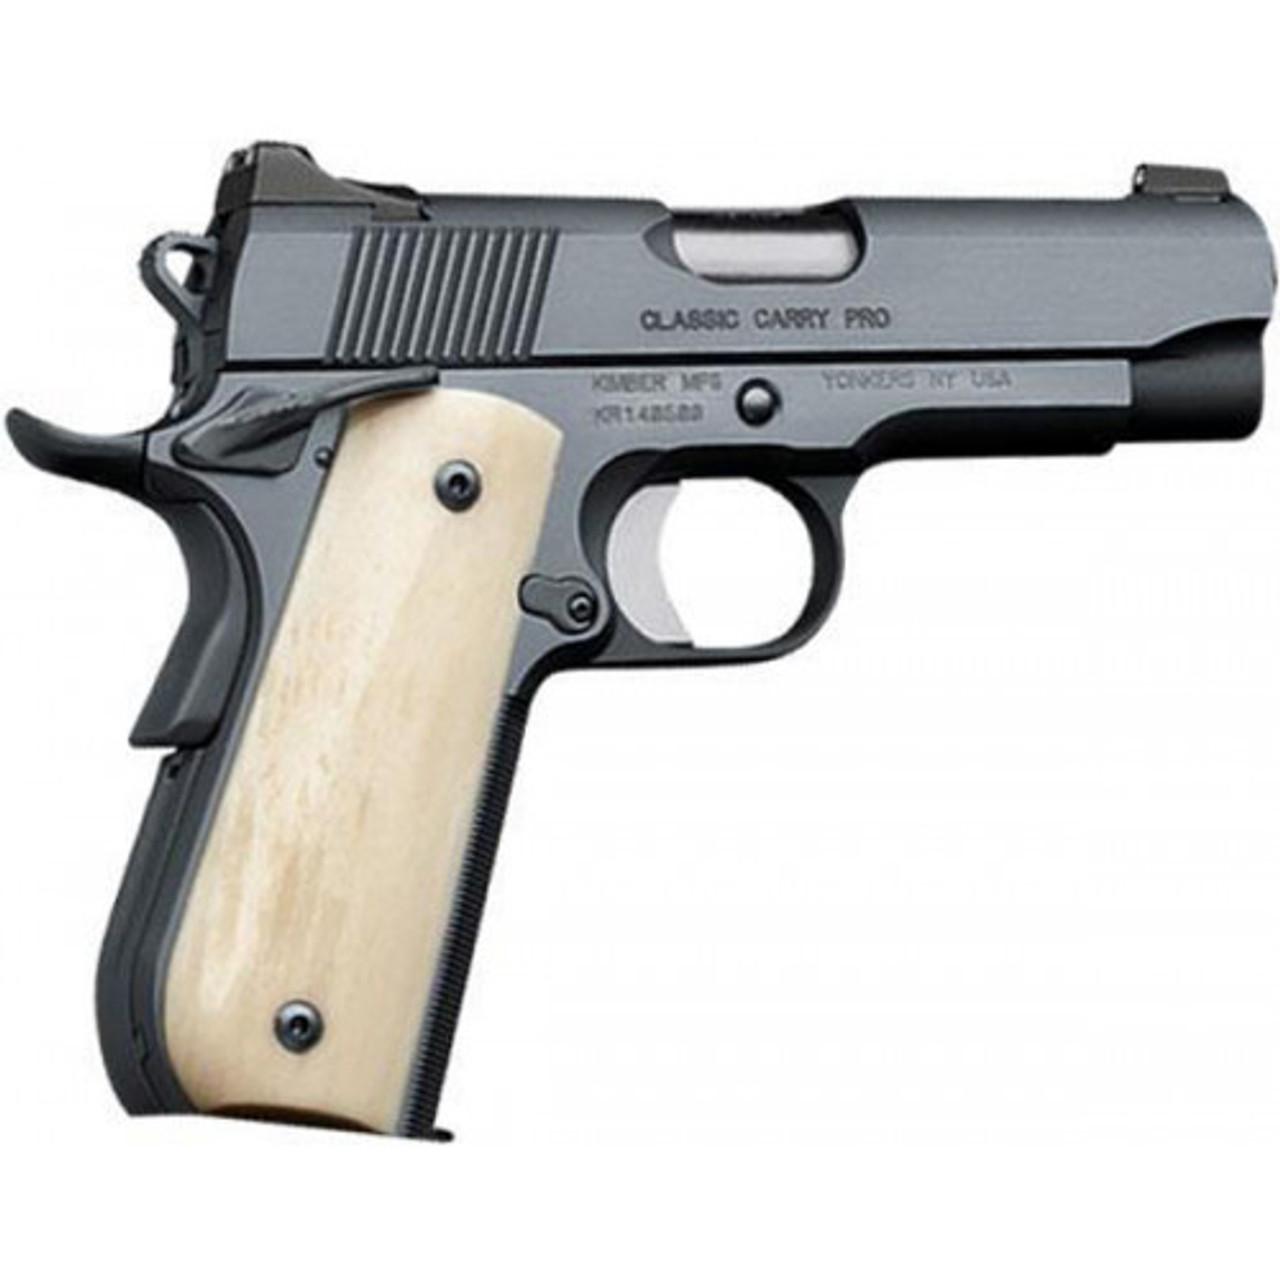 Kimber Classic Carry Pro 45 ACP, 4